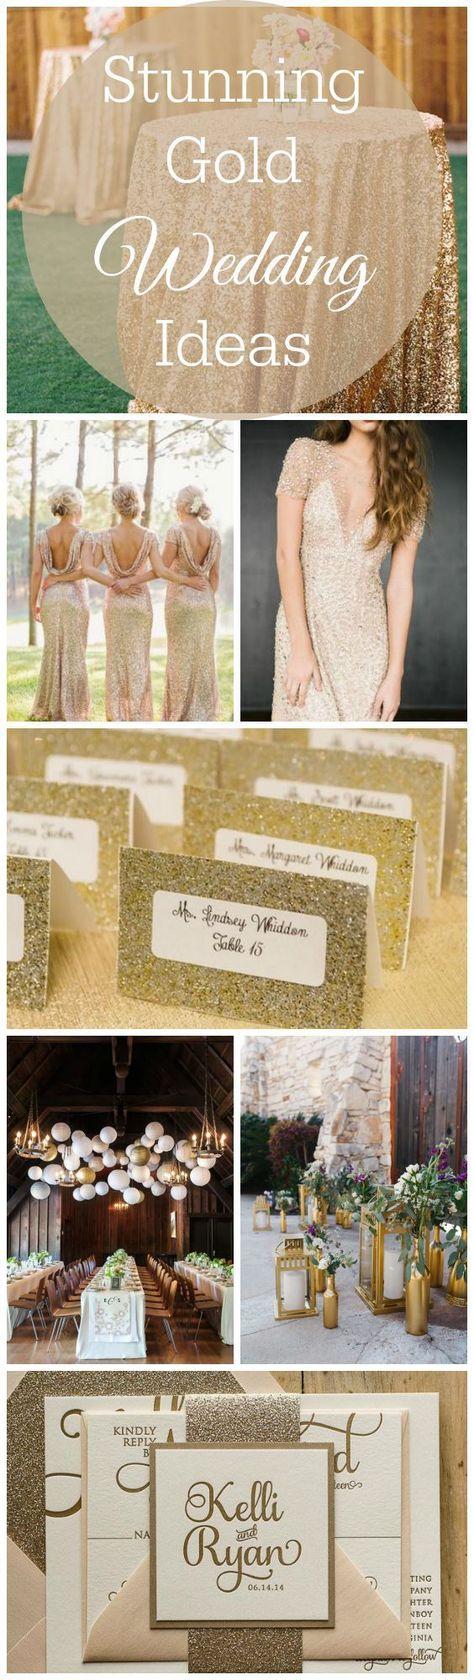 1217 best backyard style wedding images on pinterest backyard